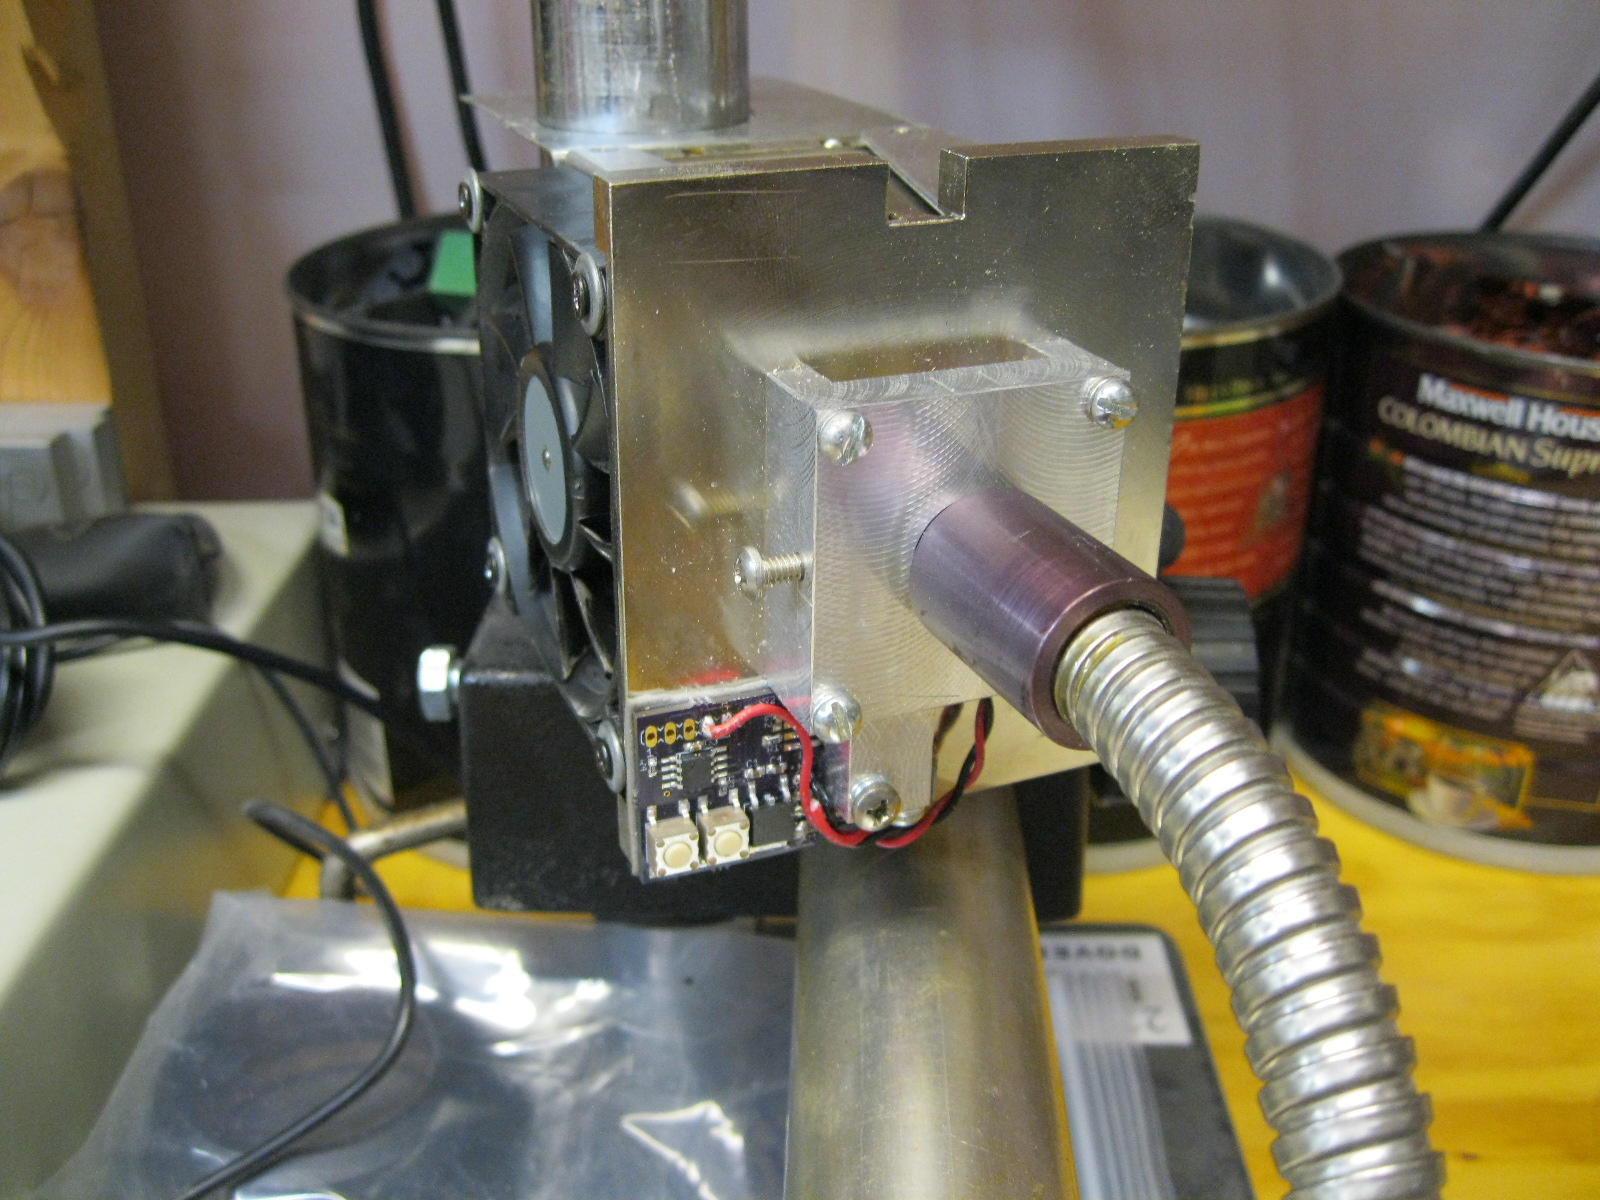 10W LED fiber light source